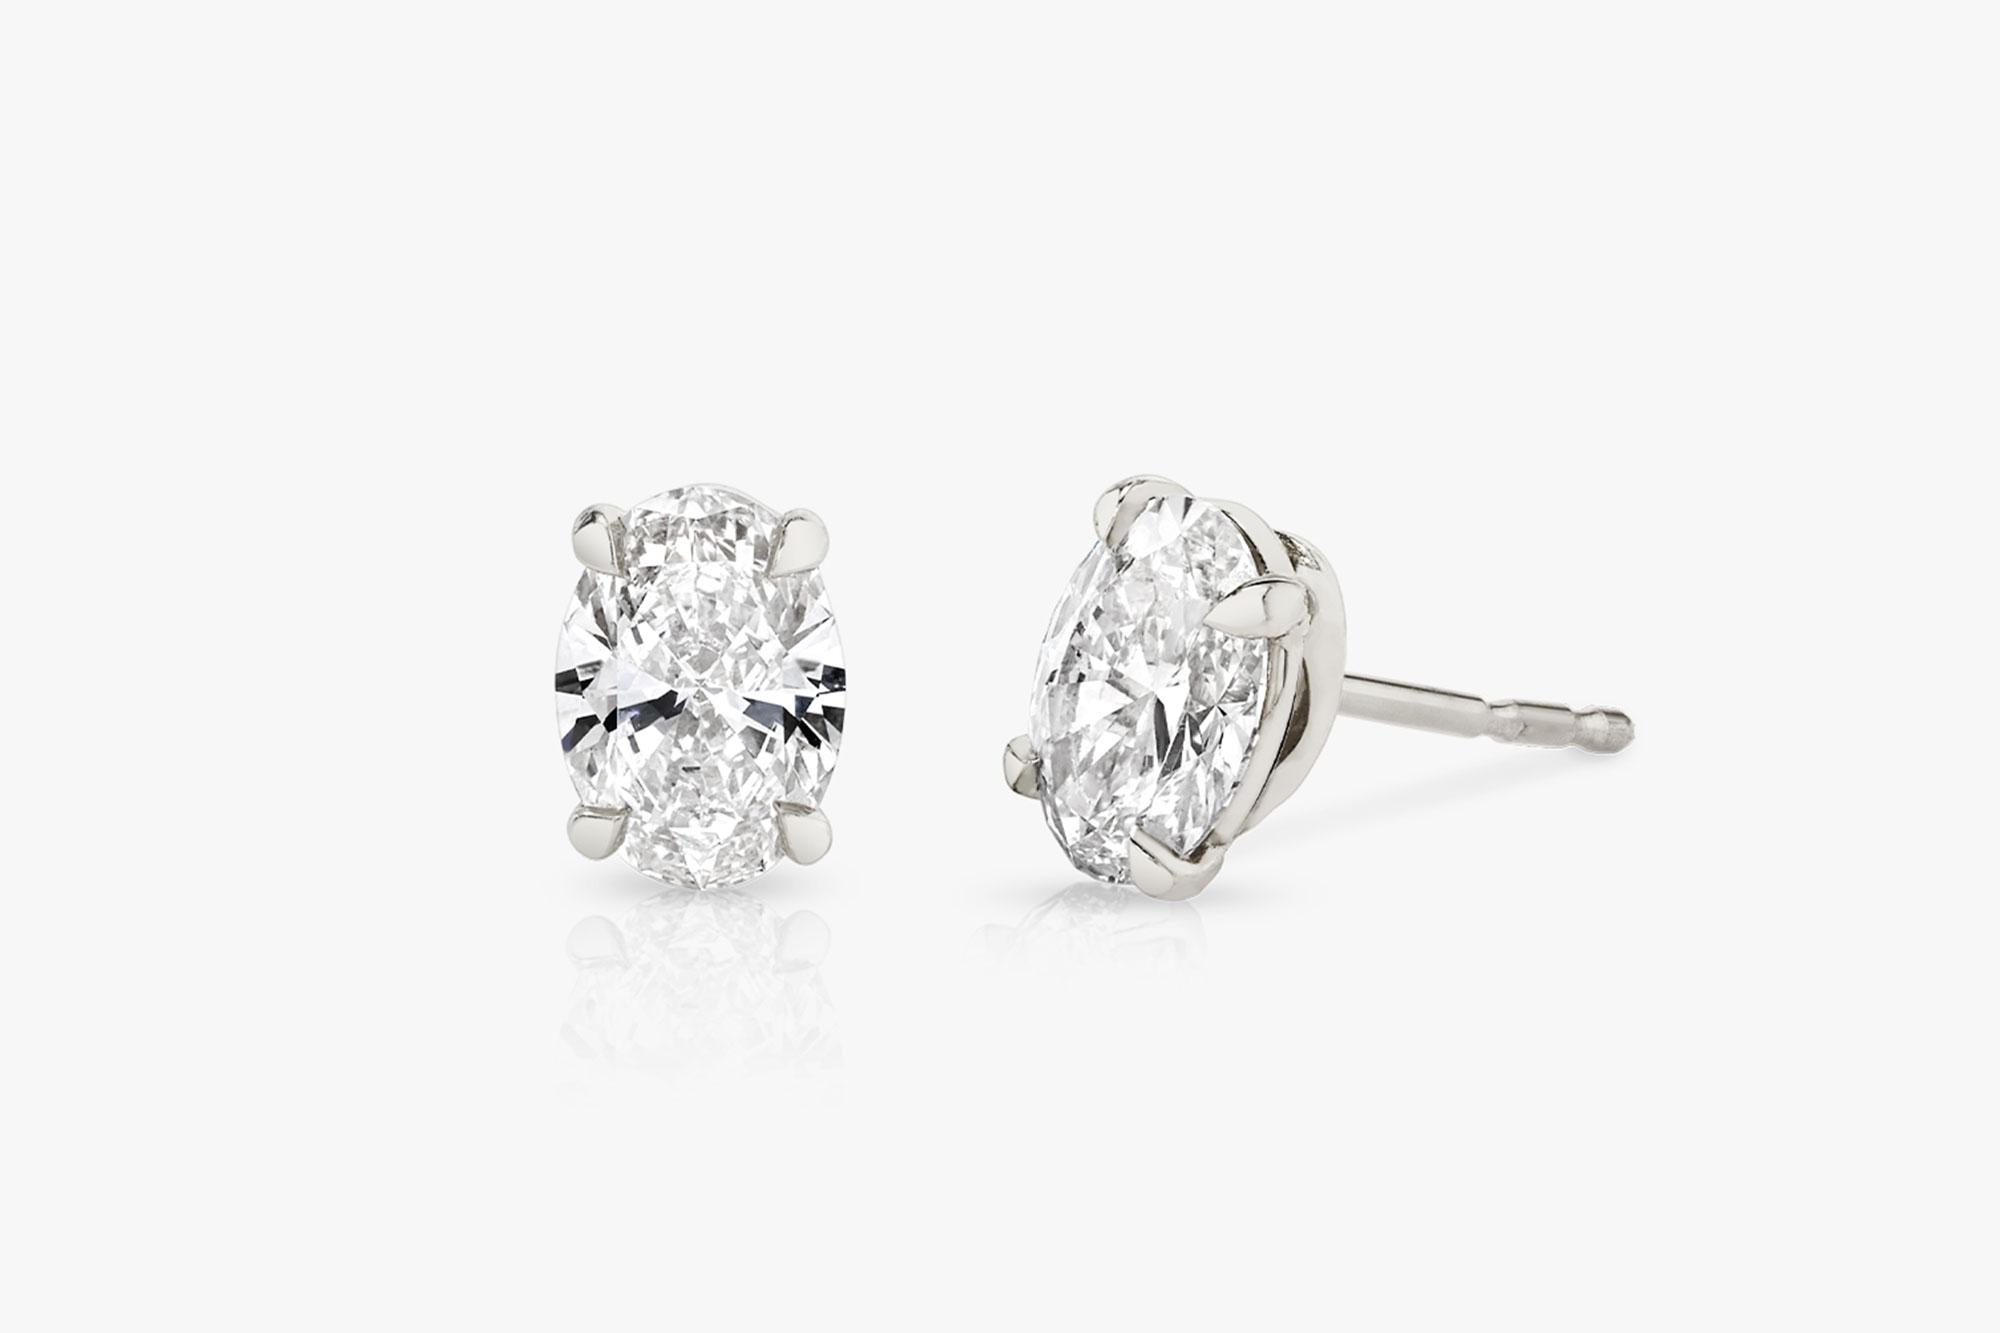 white gold, lab-grown diamonds, earrings